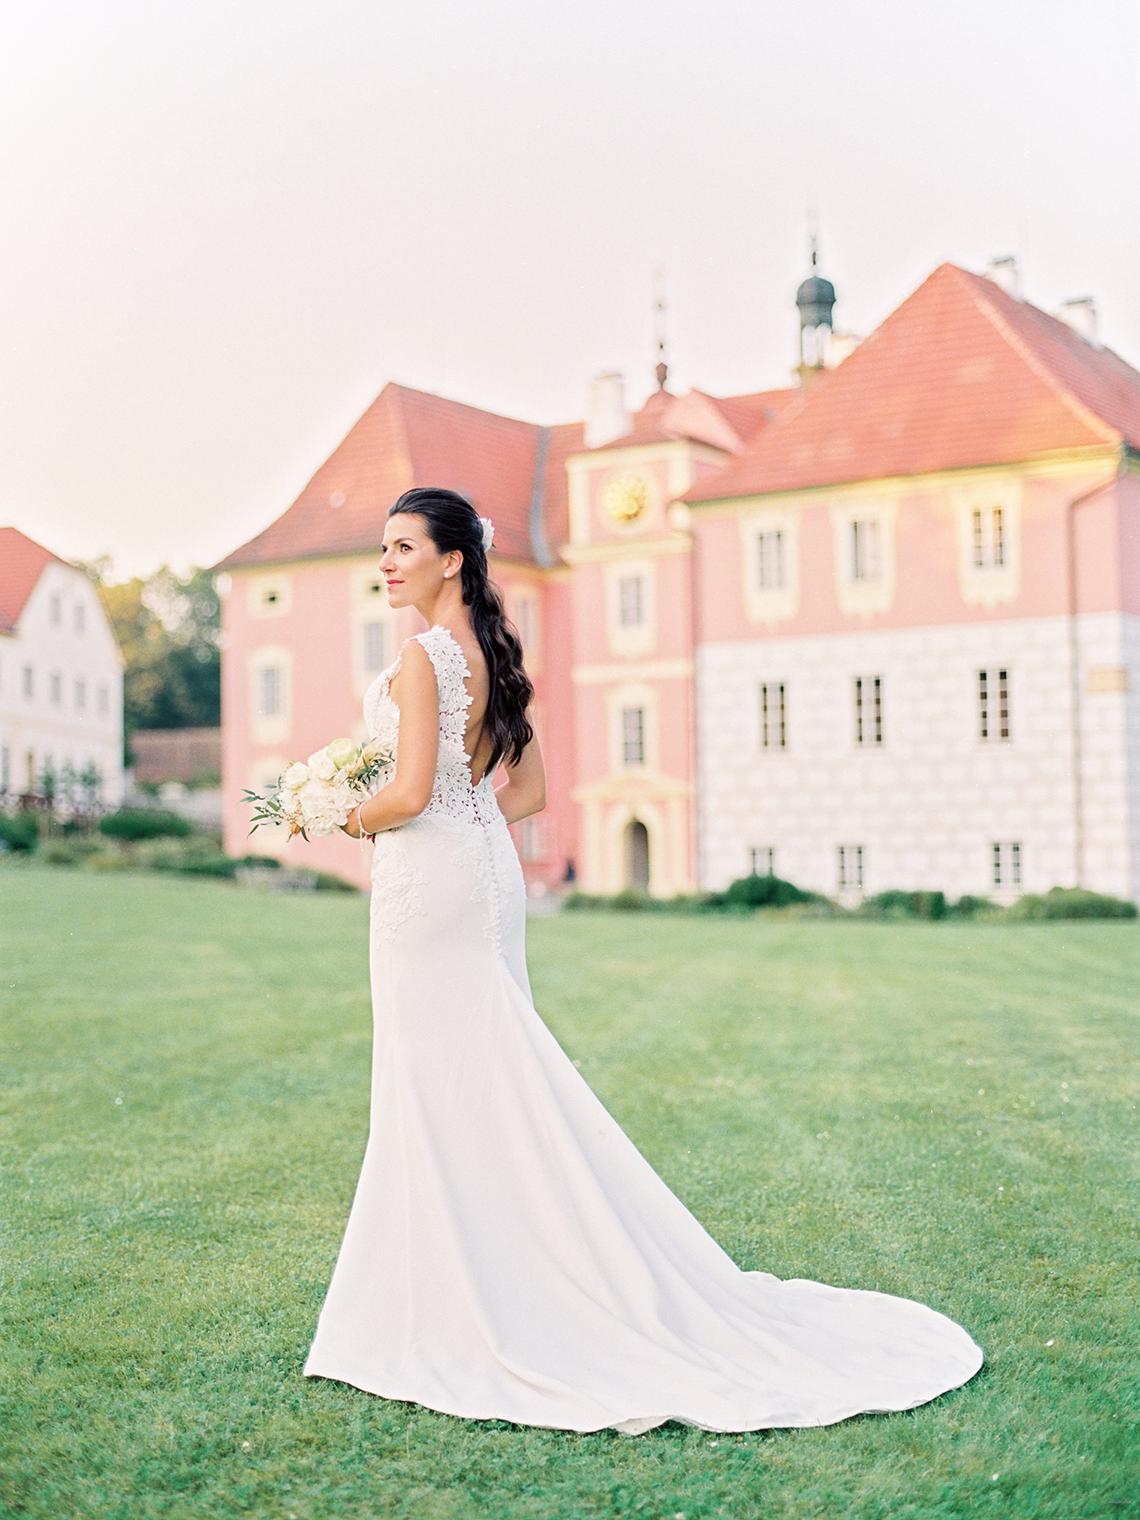 Opulent Traditional Czech Wedding in a Pink Castle – Tomas Dolejsi – Chateau Mitrowicz 45